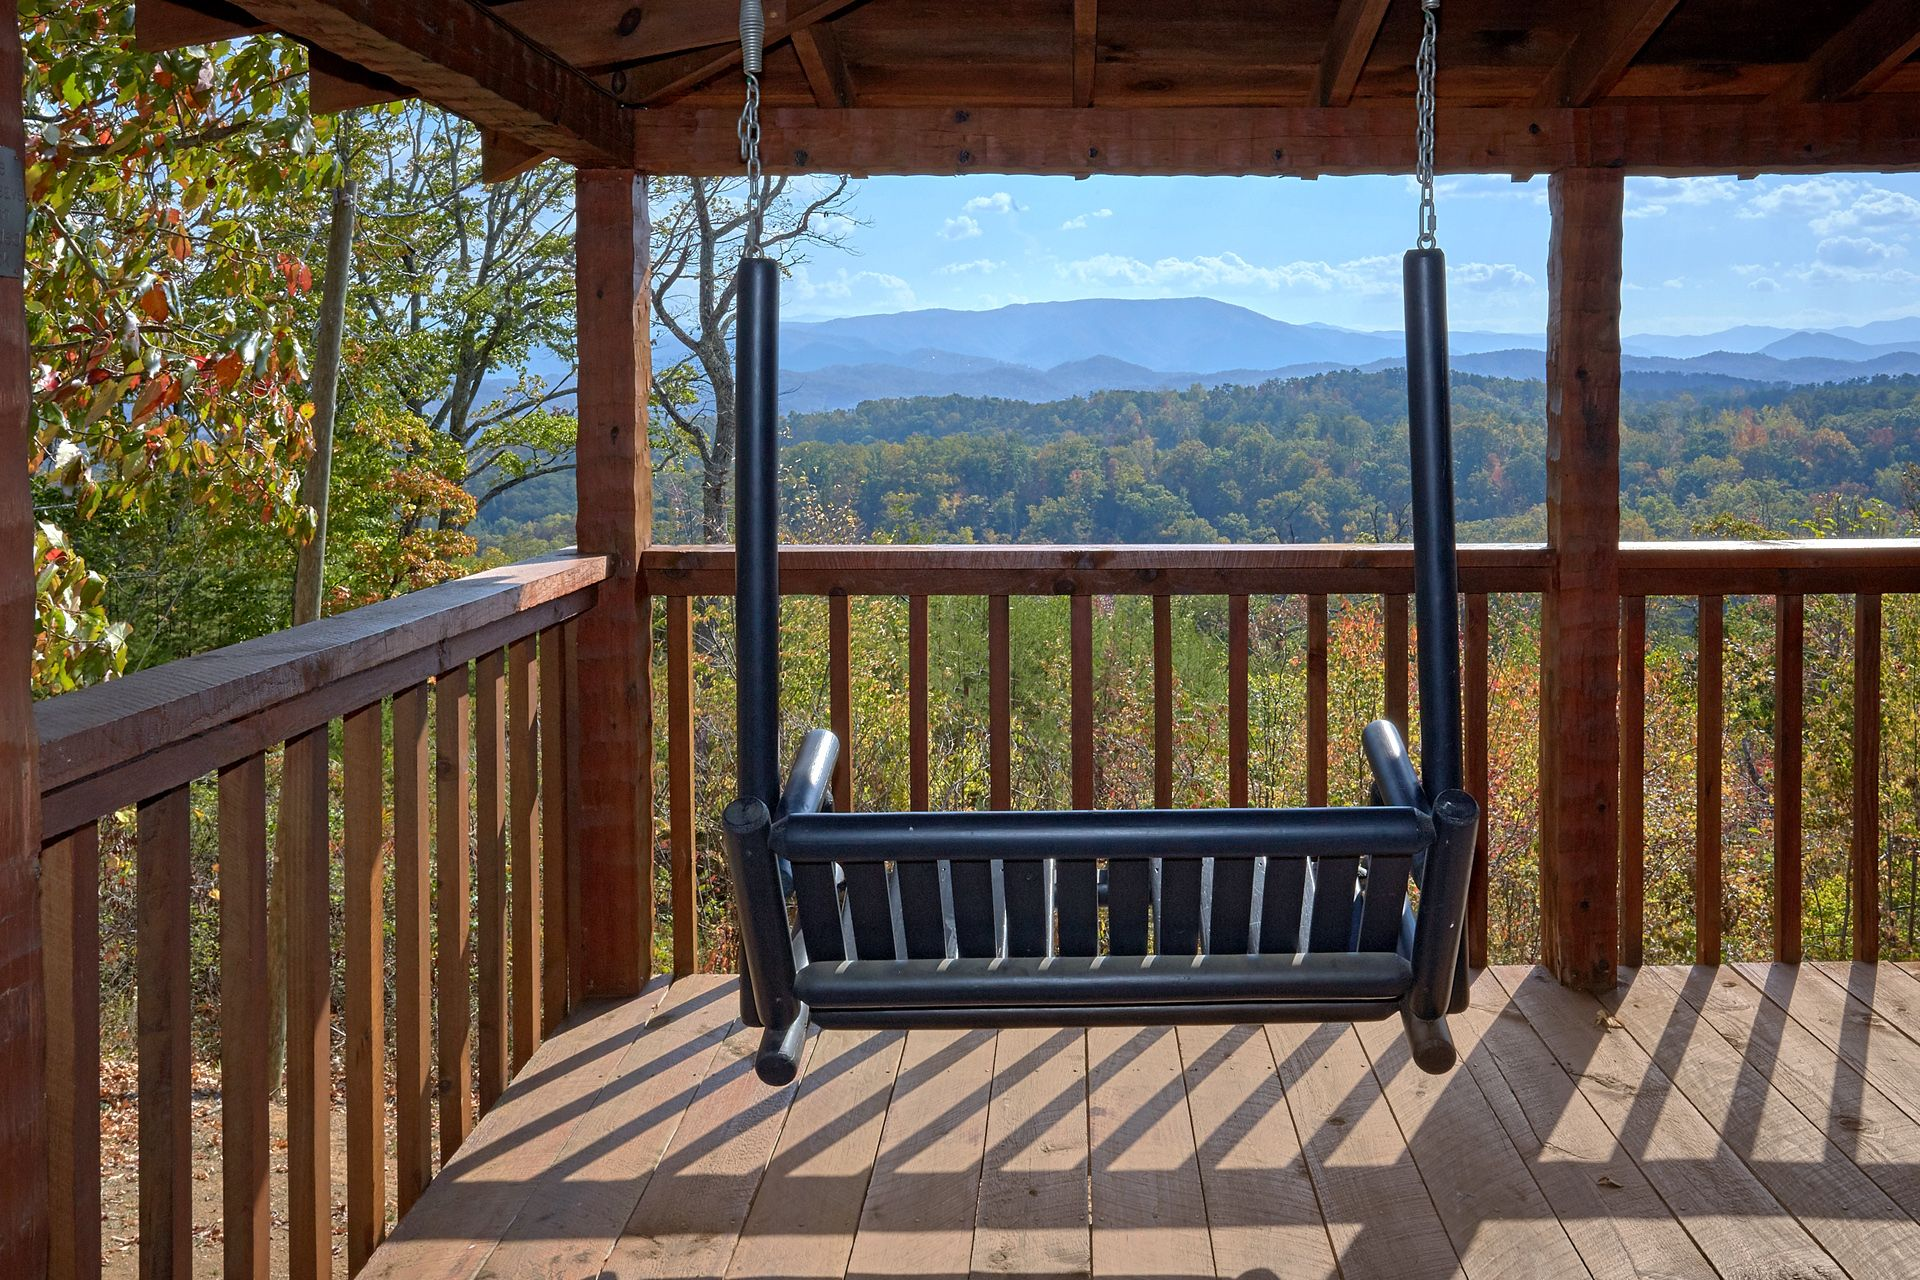 BARE SNUGGLIN' 1 BEDROOM cabin in Sevierville